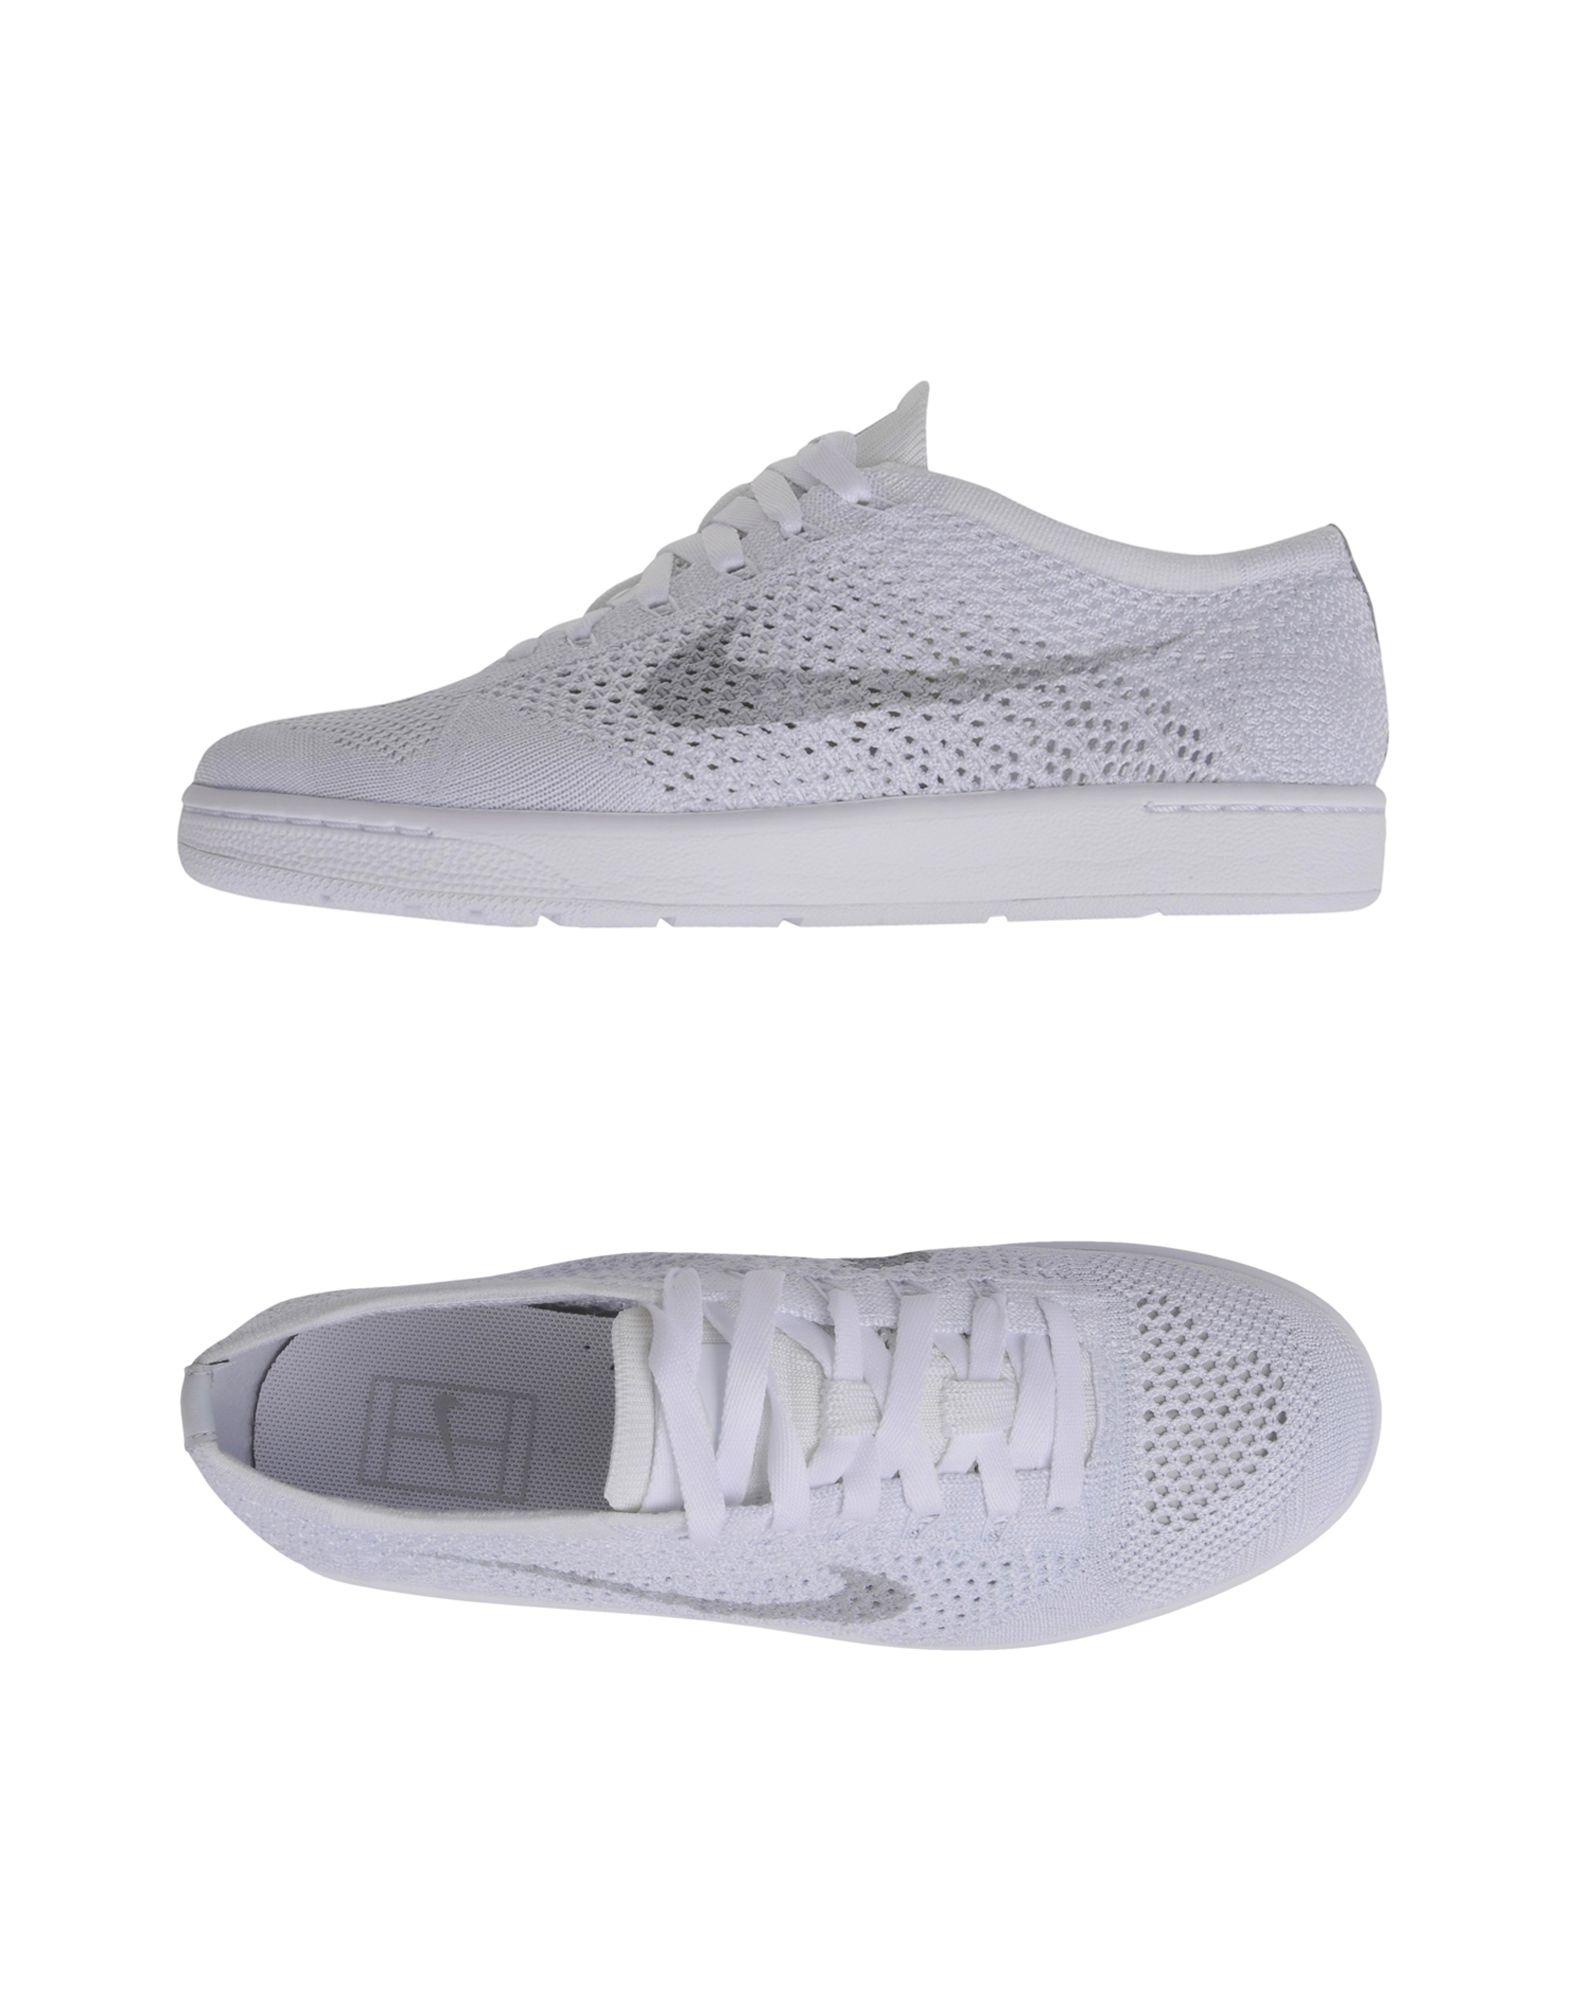 Sneakers Nike W Tennis Classic Ultra Flyknit - Donna - Acquista online su